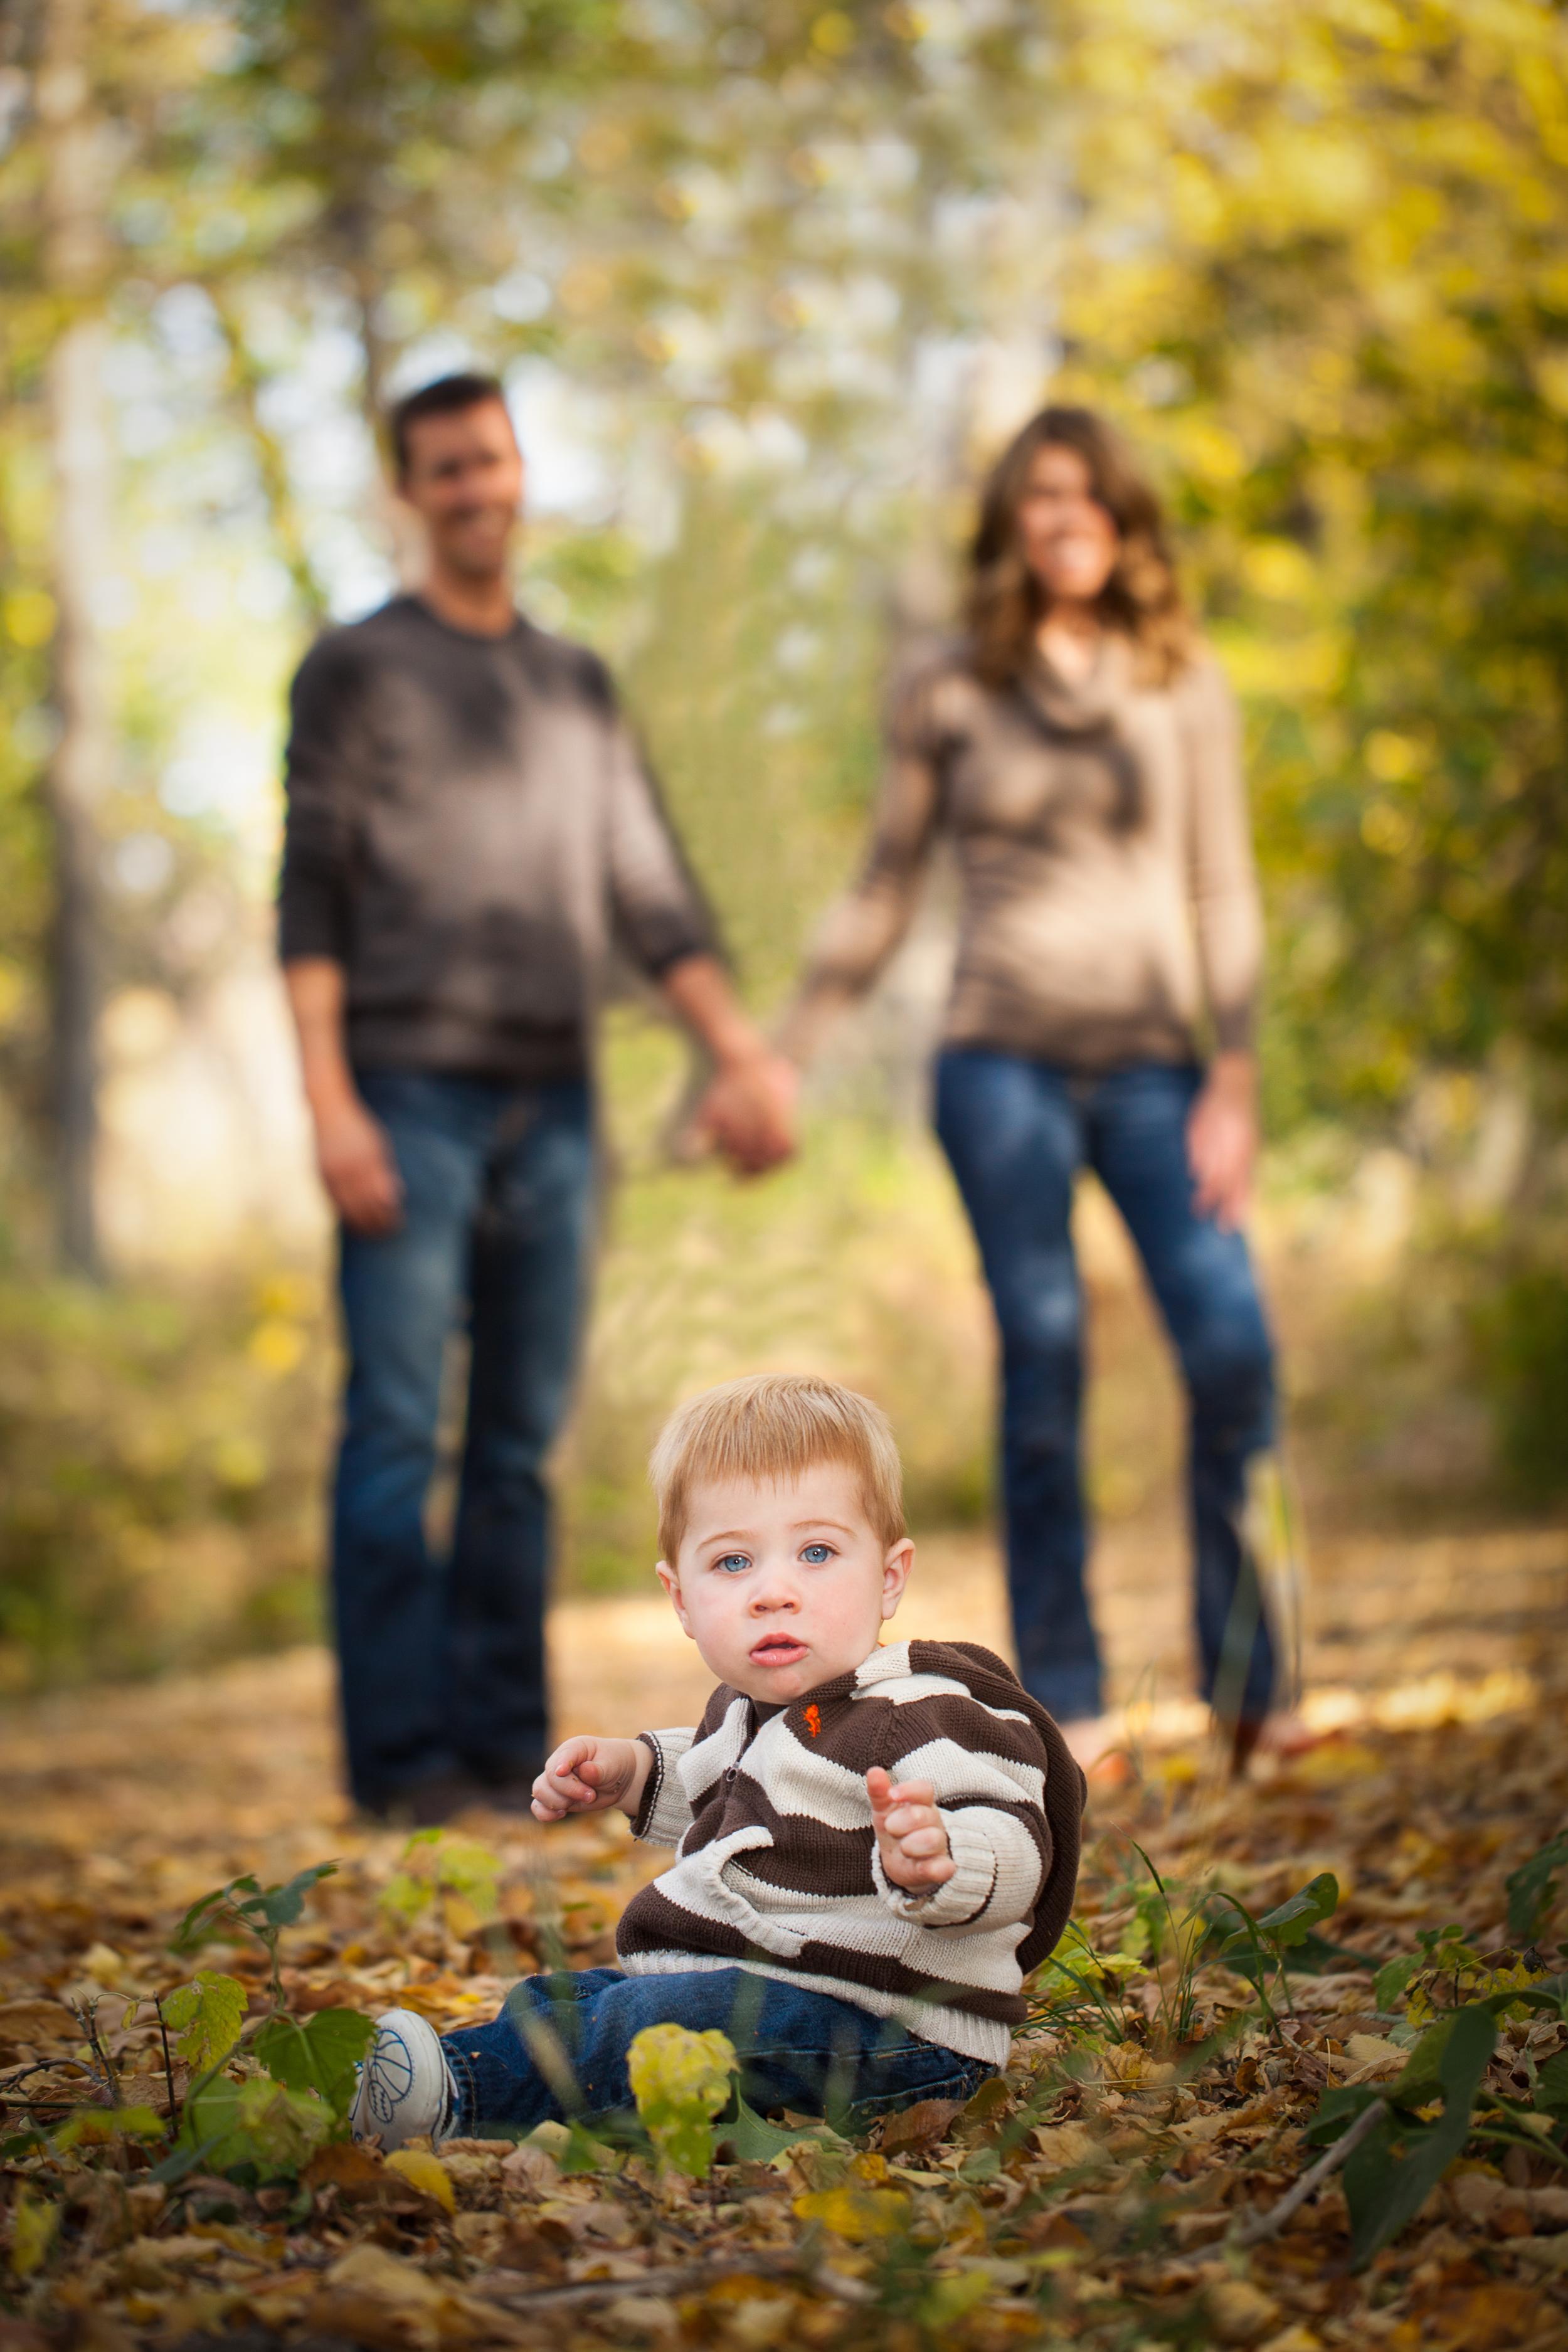 20120930_KP Dale Family Fall Gooseberry_1919-Edit.jpg